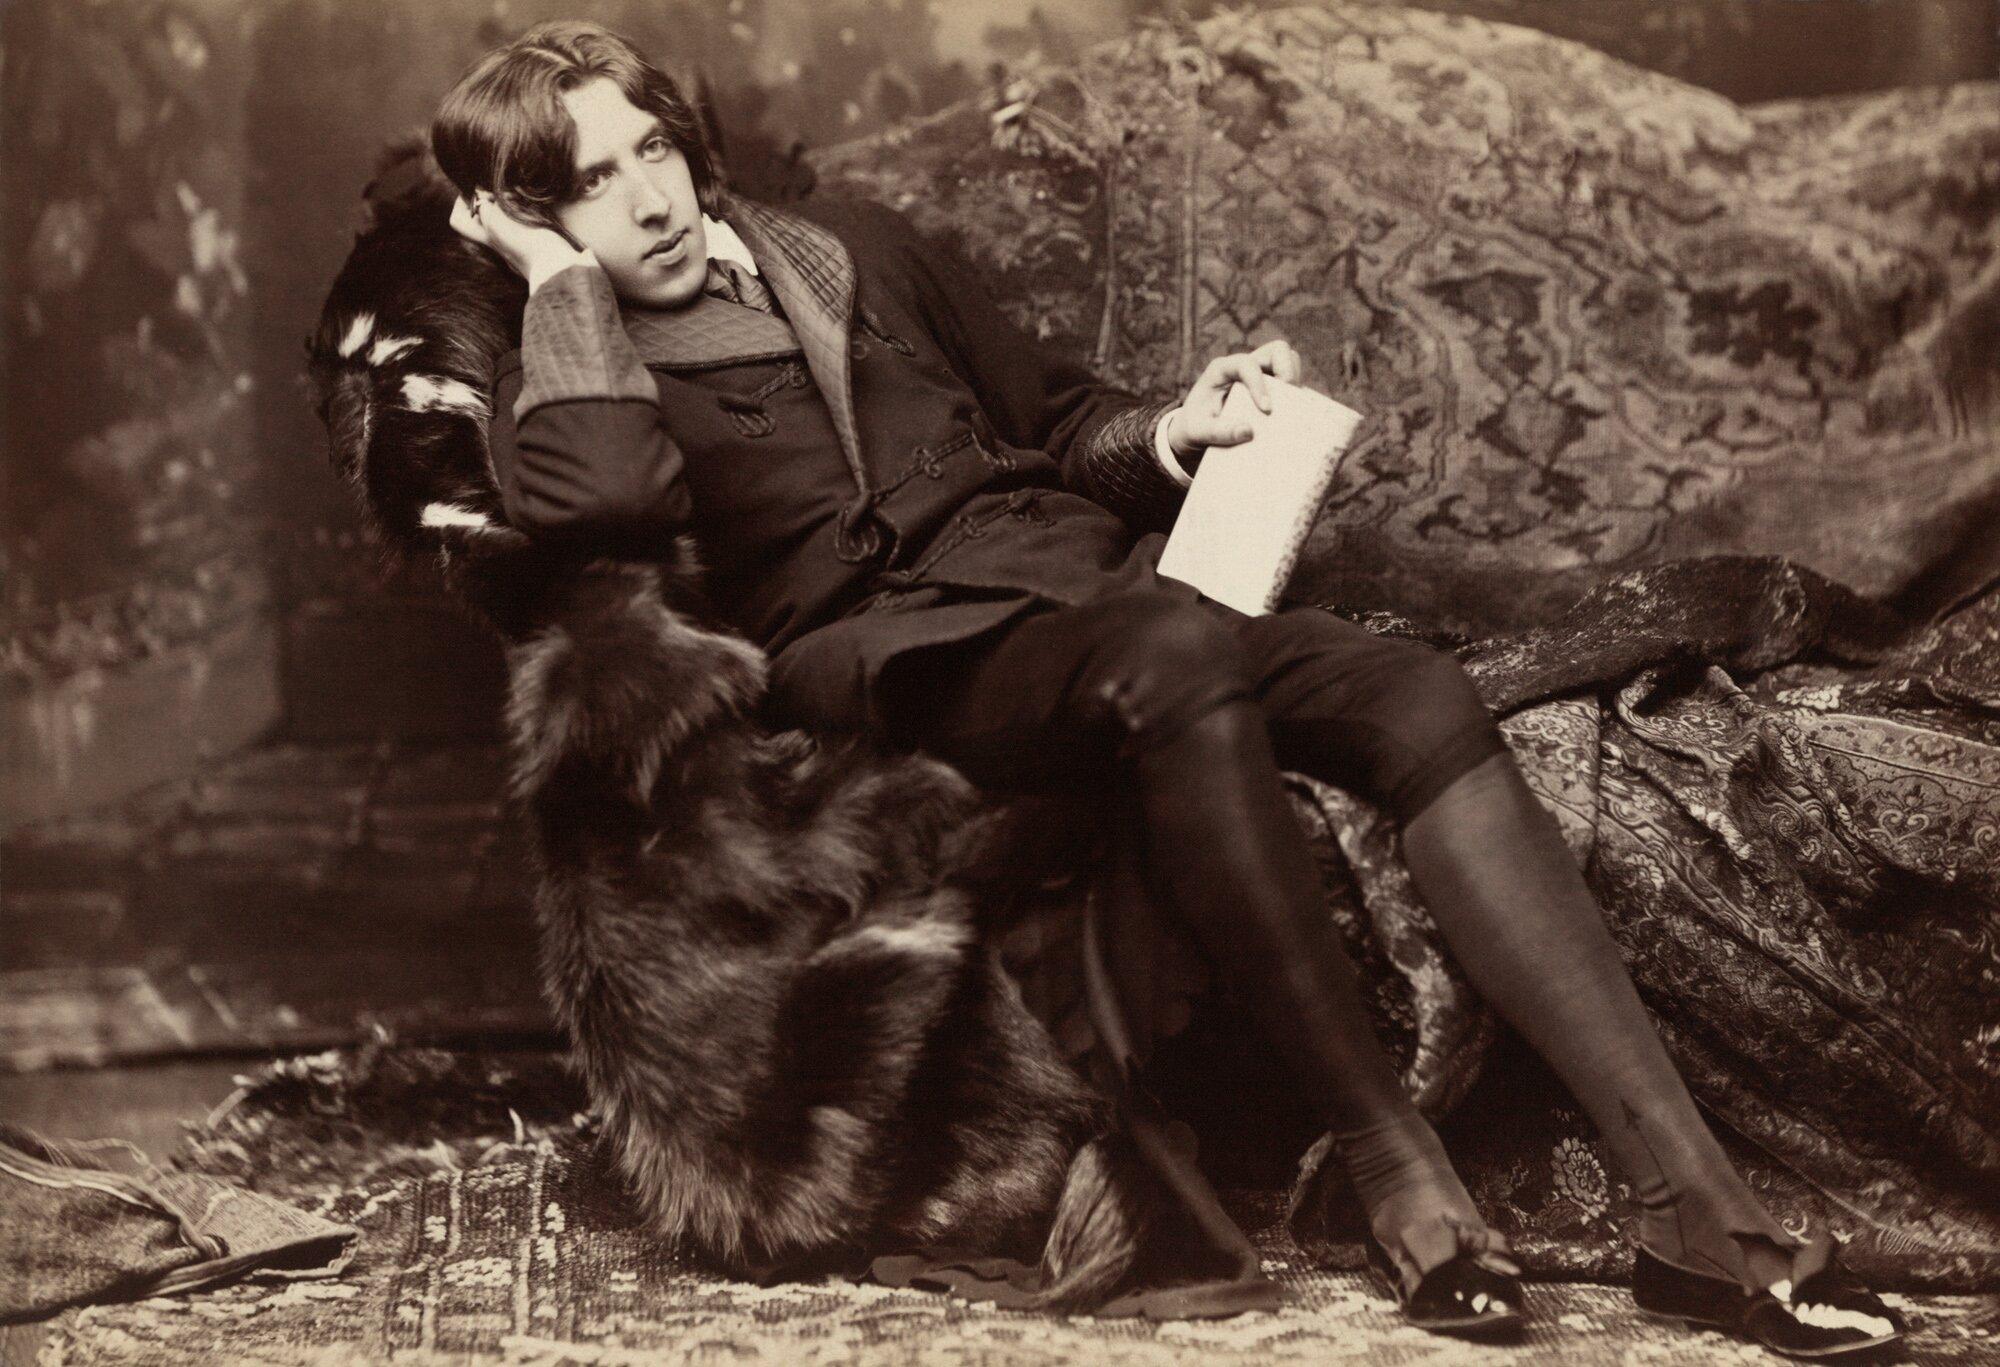 Portret OscaraWilde'a Portret OscaraWilde'a Źródło: Napoleon Saron, 1882, Metropolitan Museum of Art, domena publiczna.